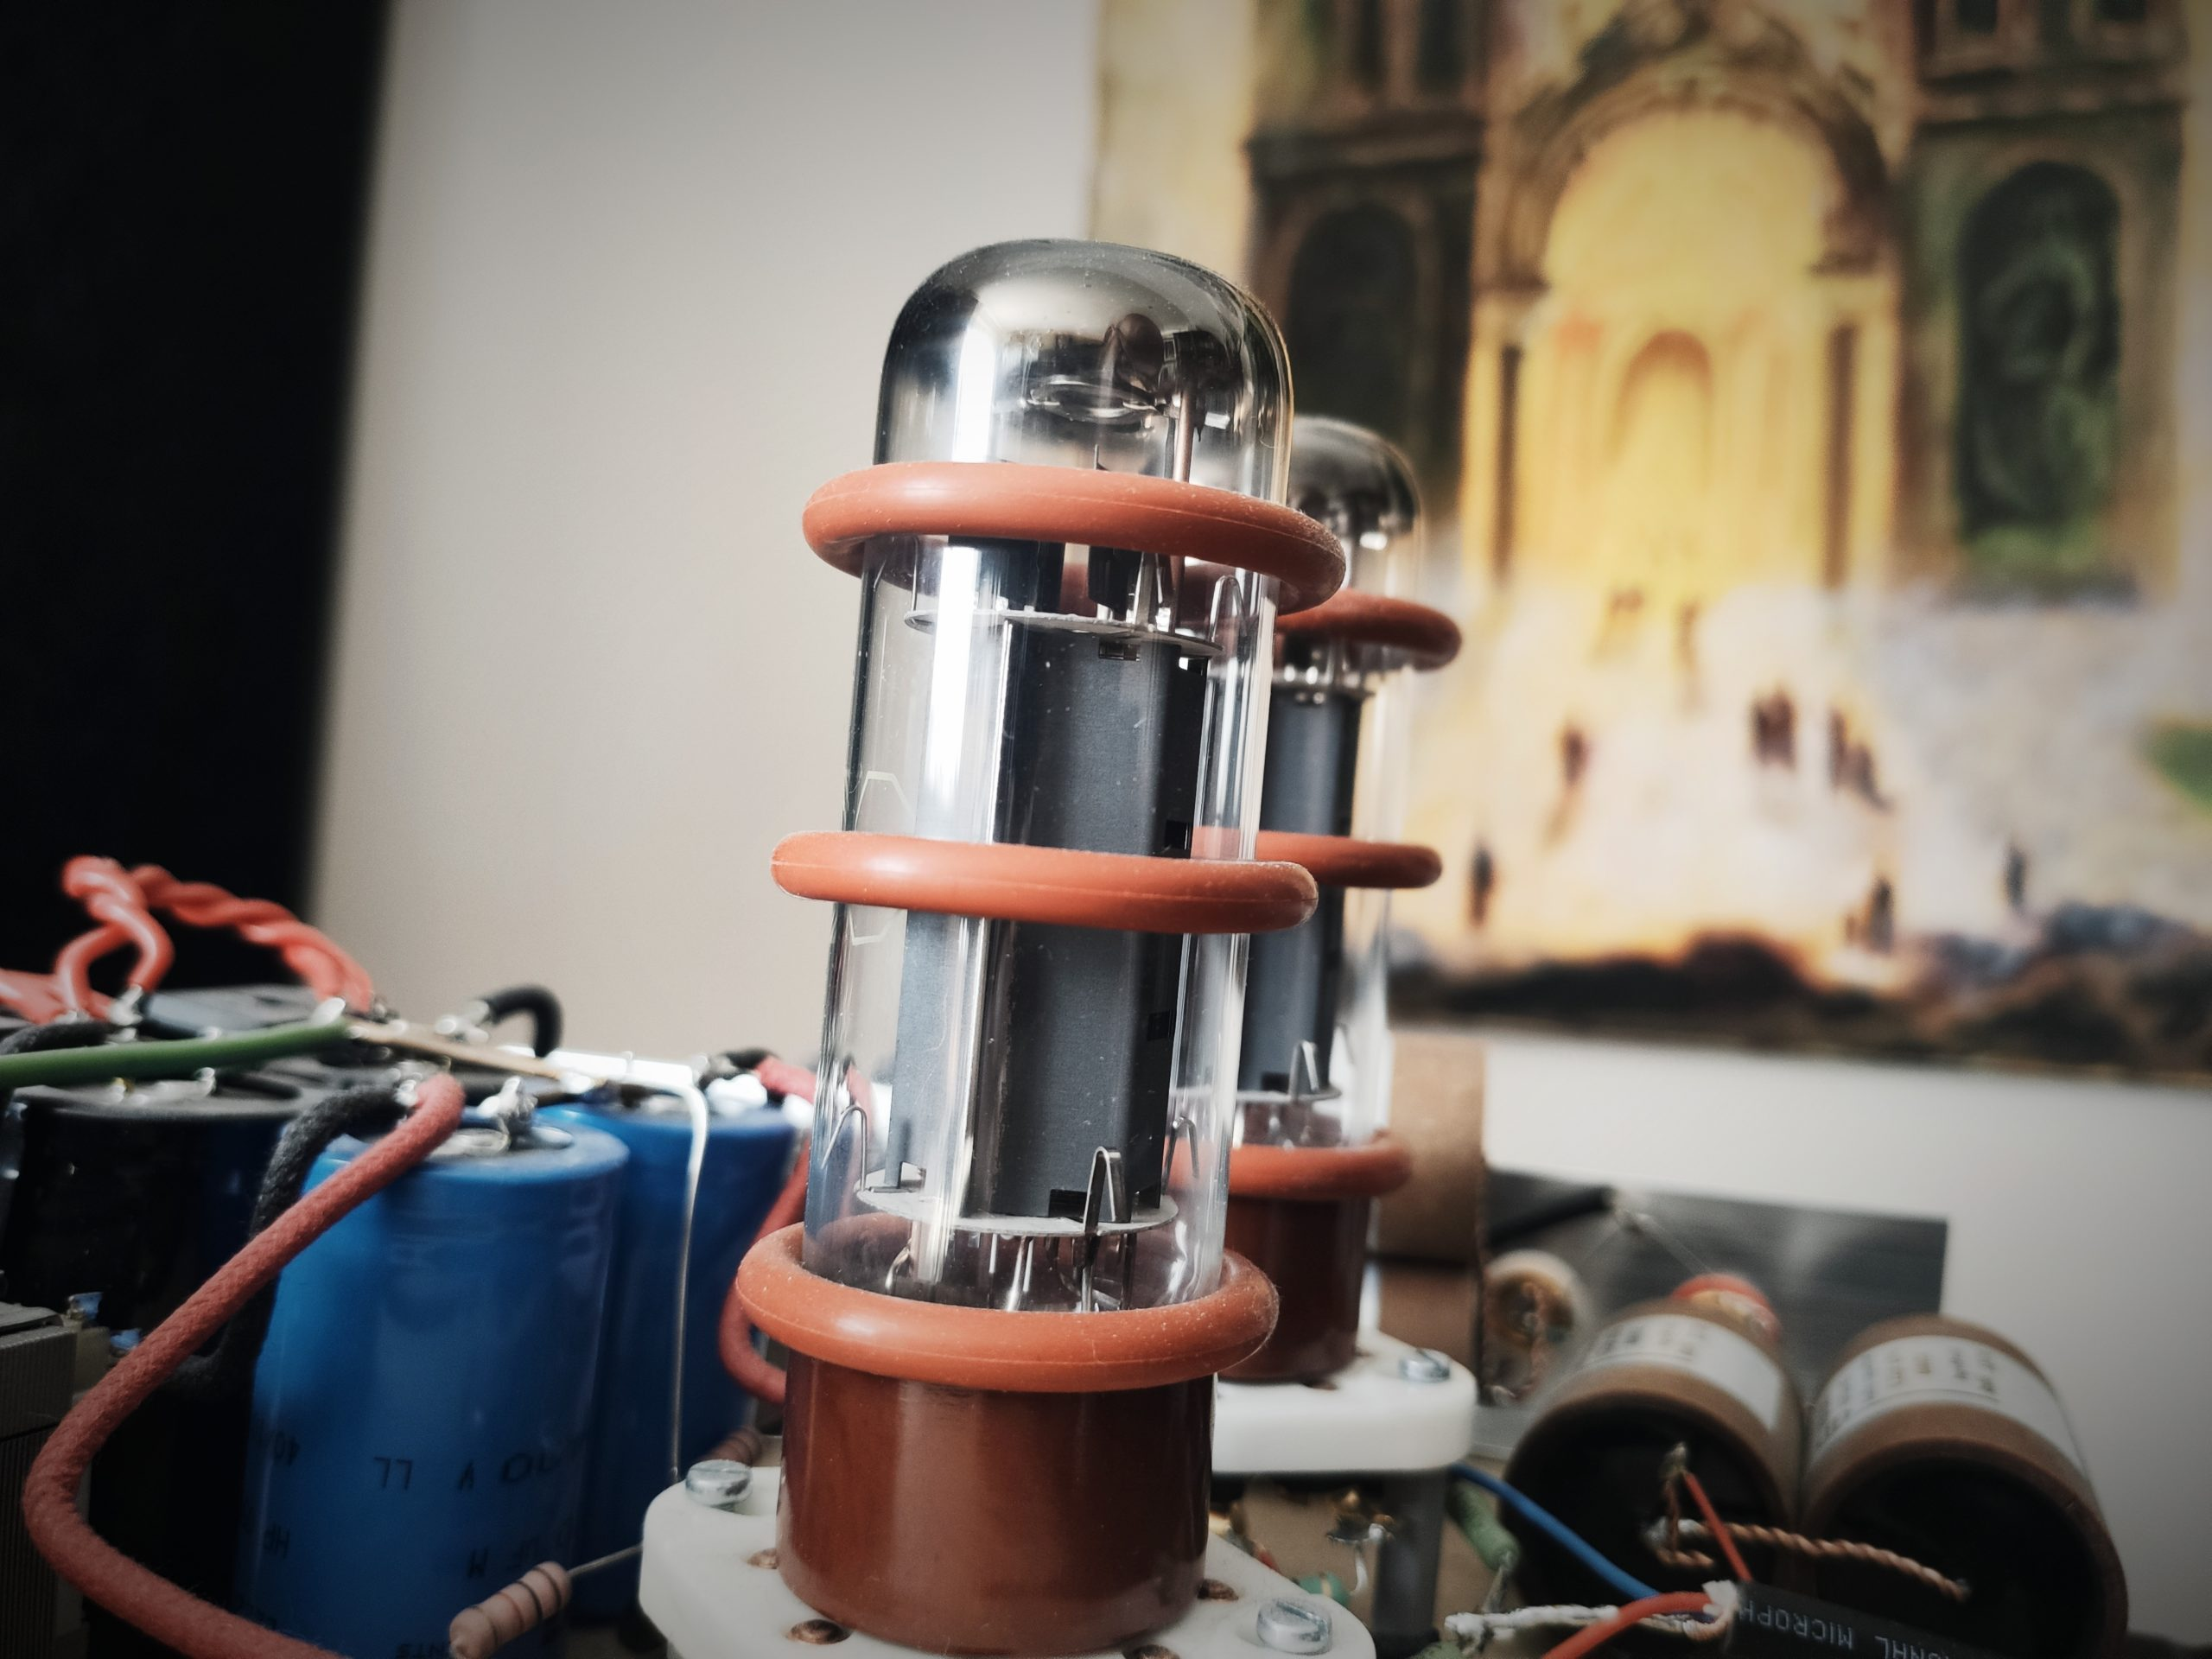 denon-lampizacja-cd-15-scaled.jpg